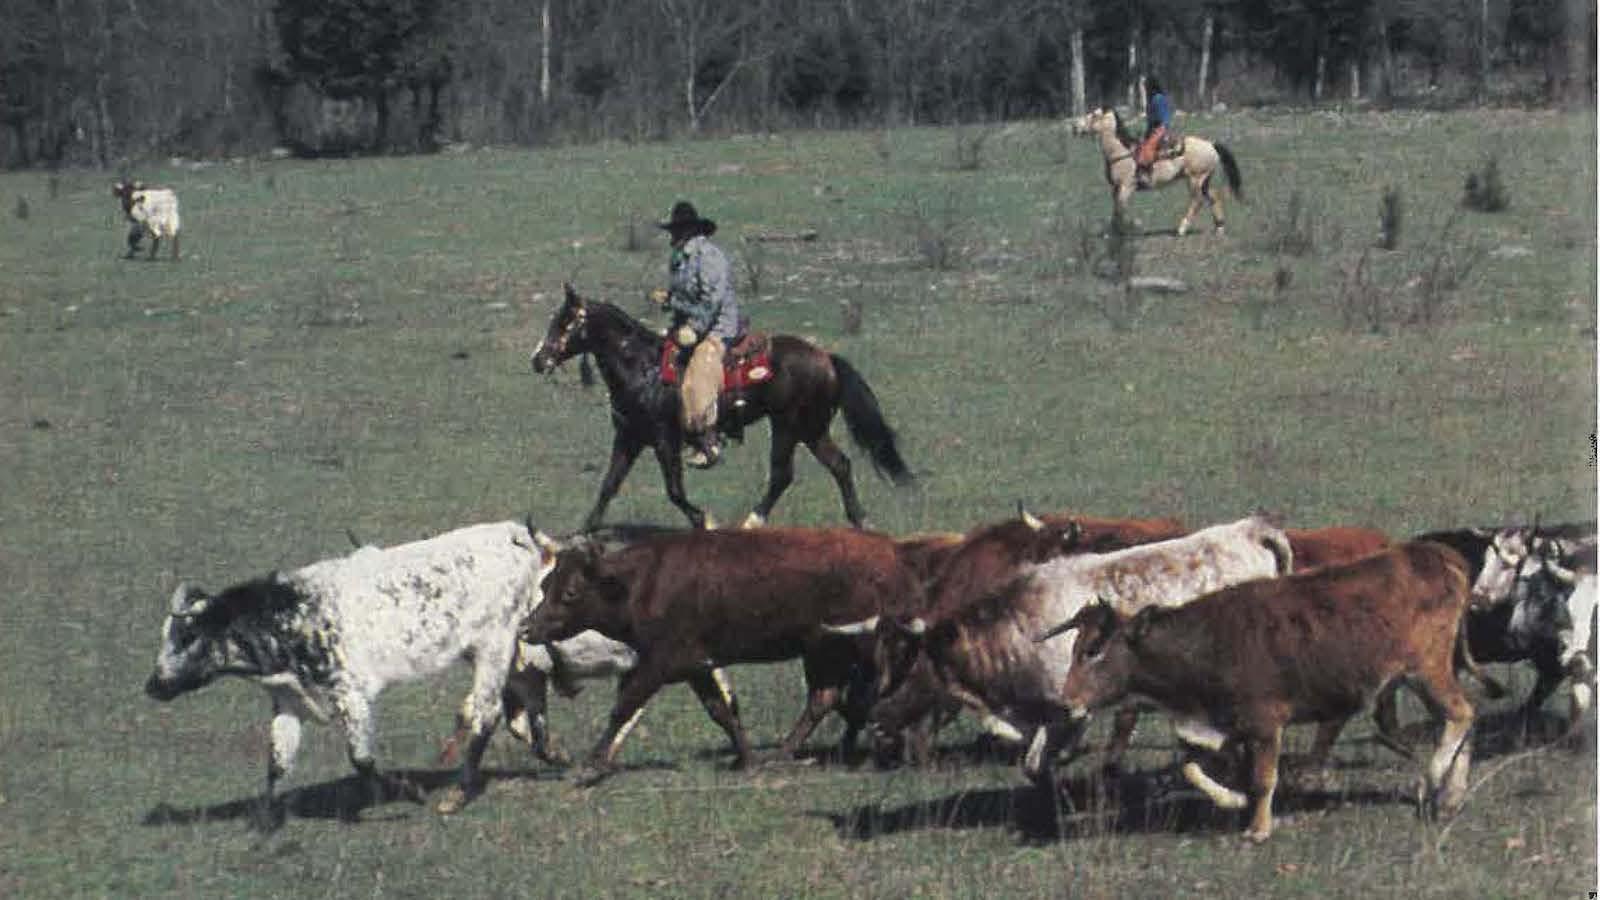 Twin Pines Ranch herding corriente cattle